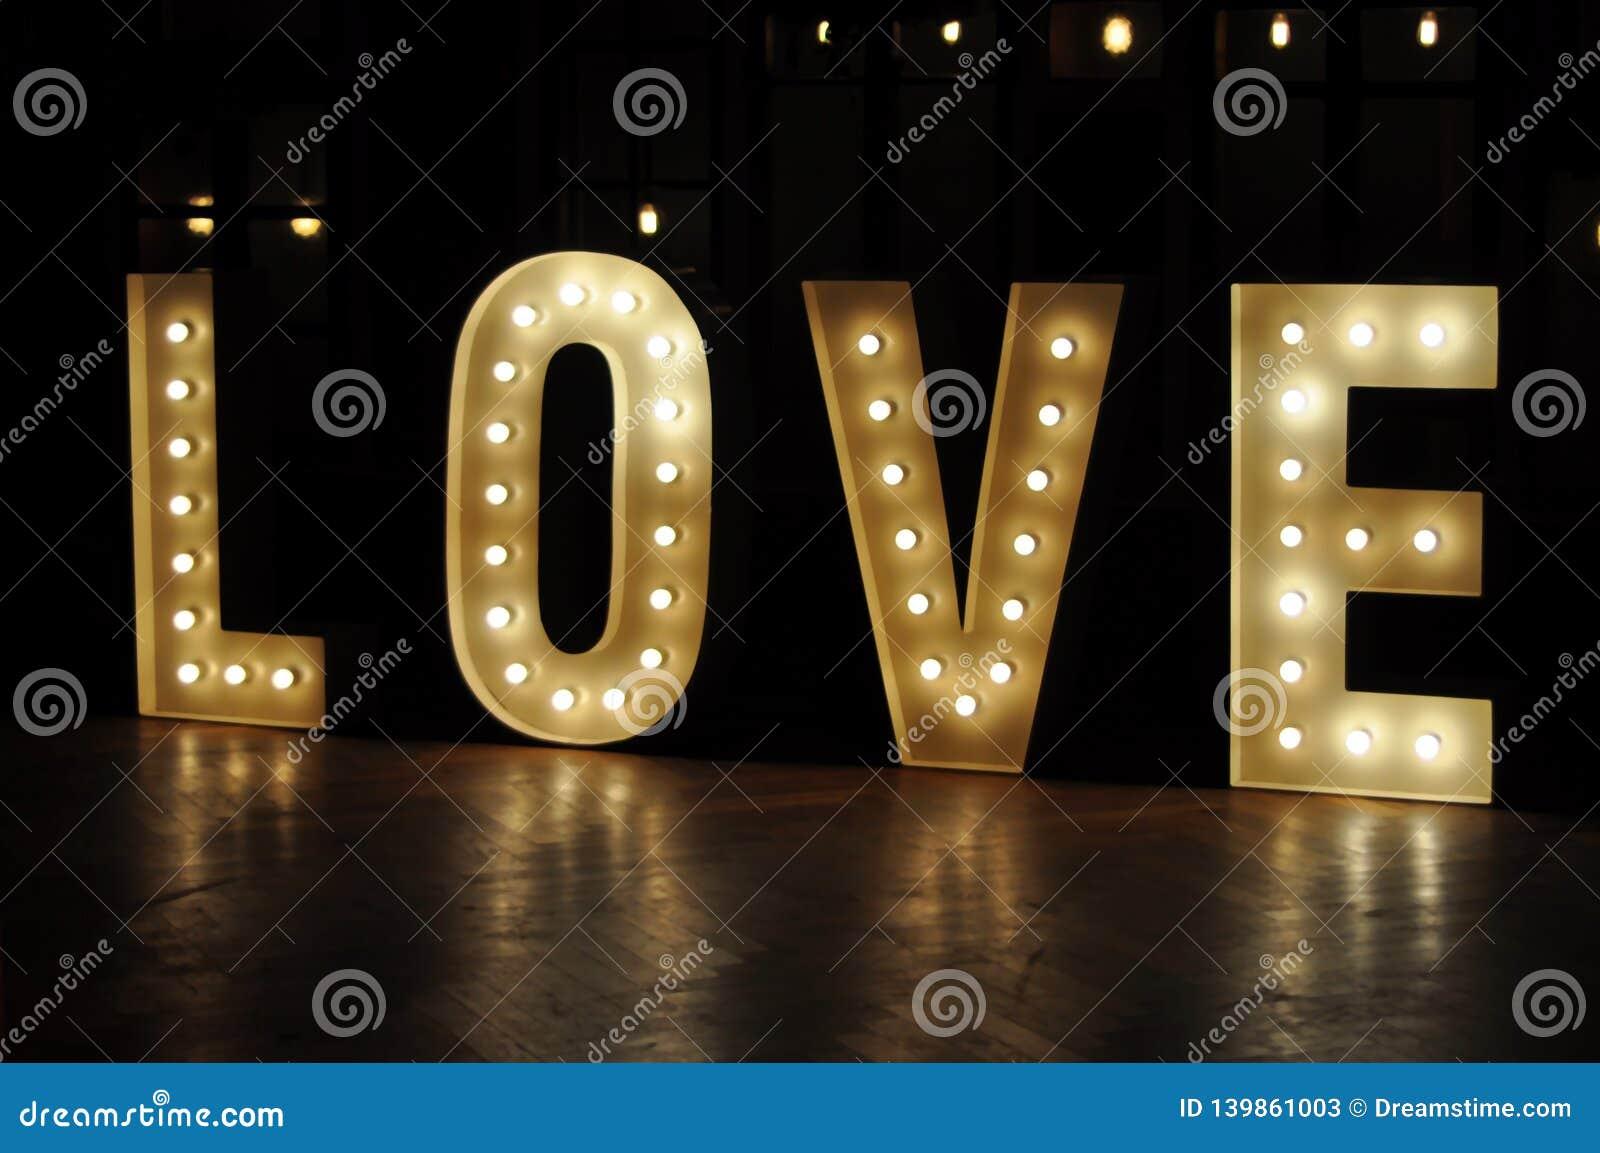 Decorative letter lights love